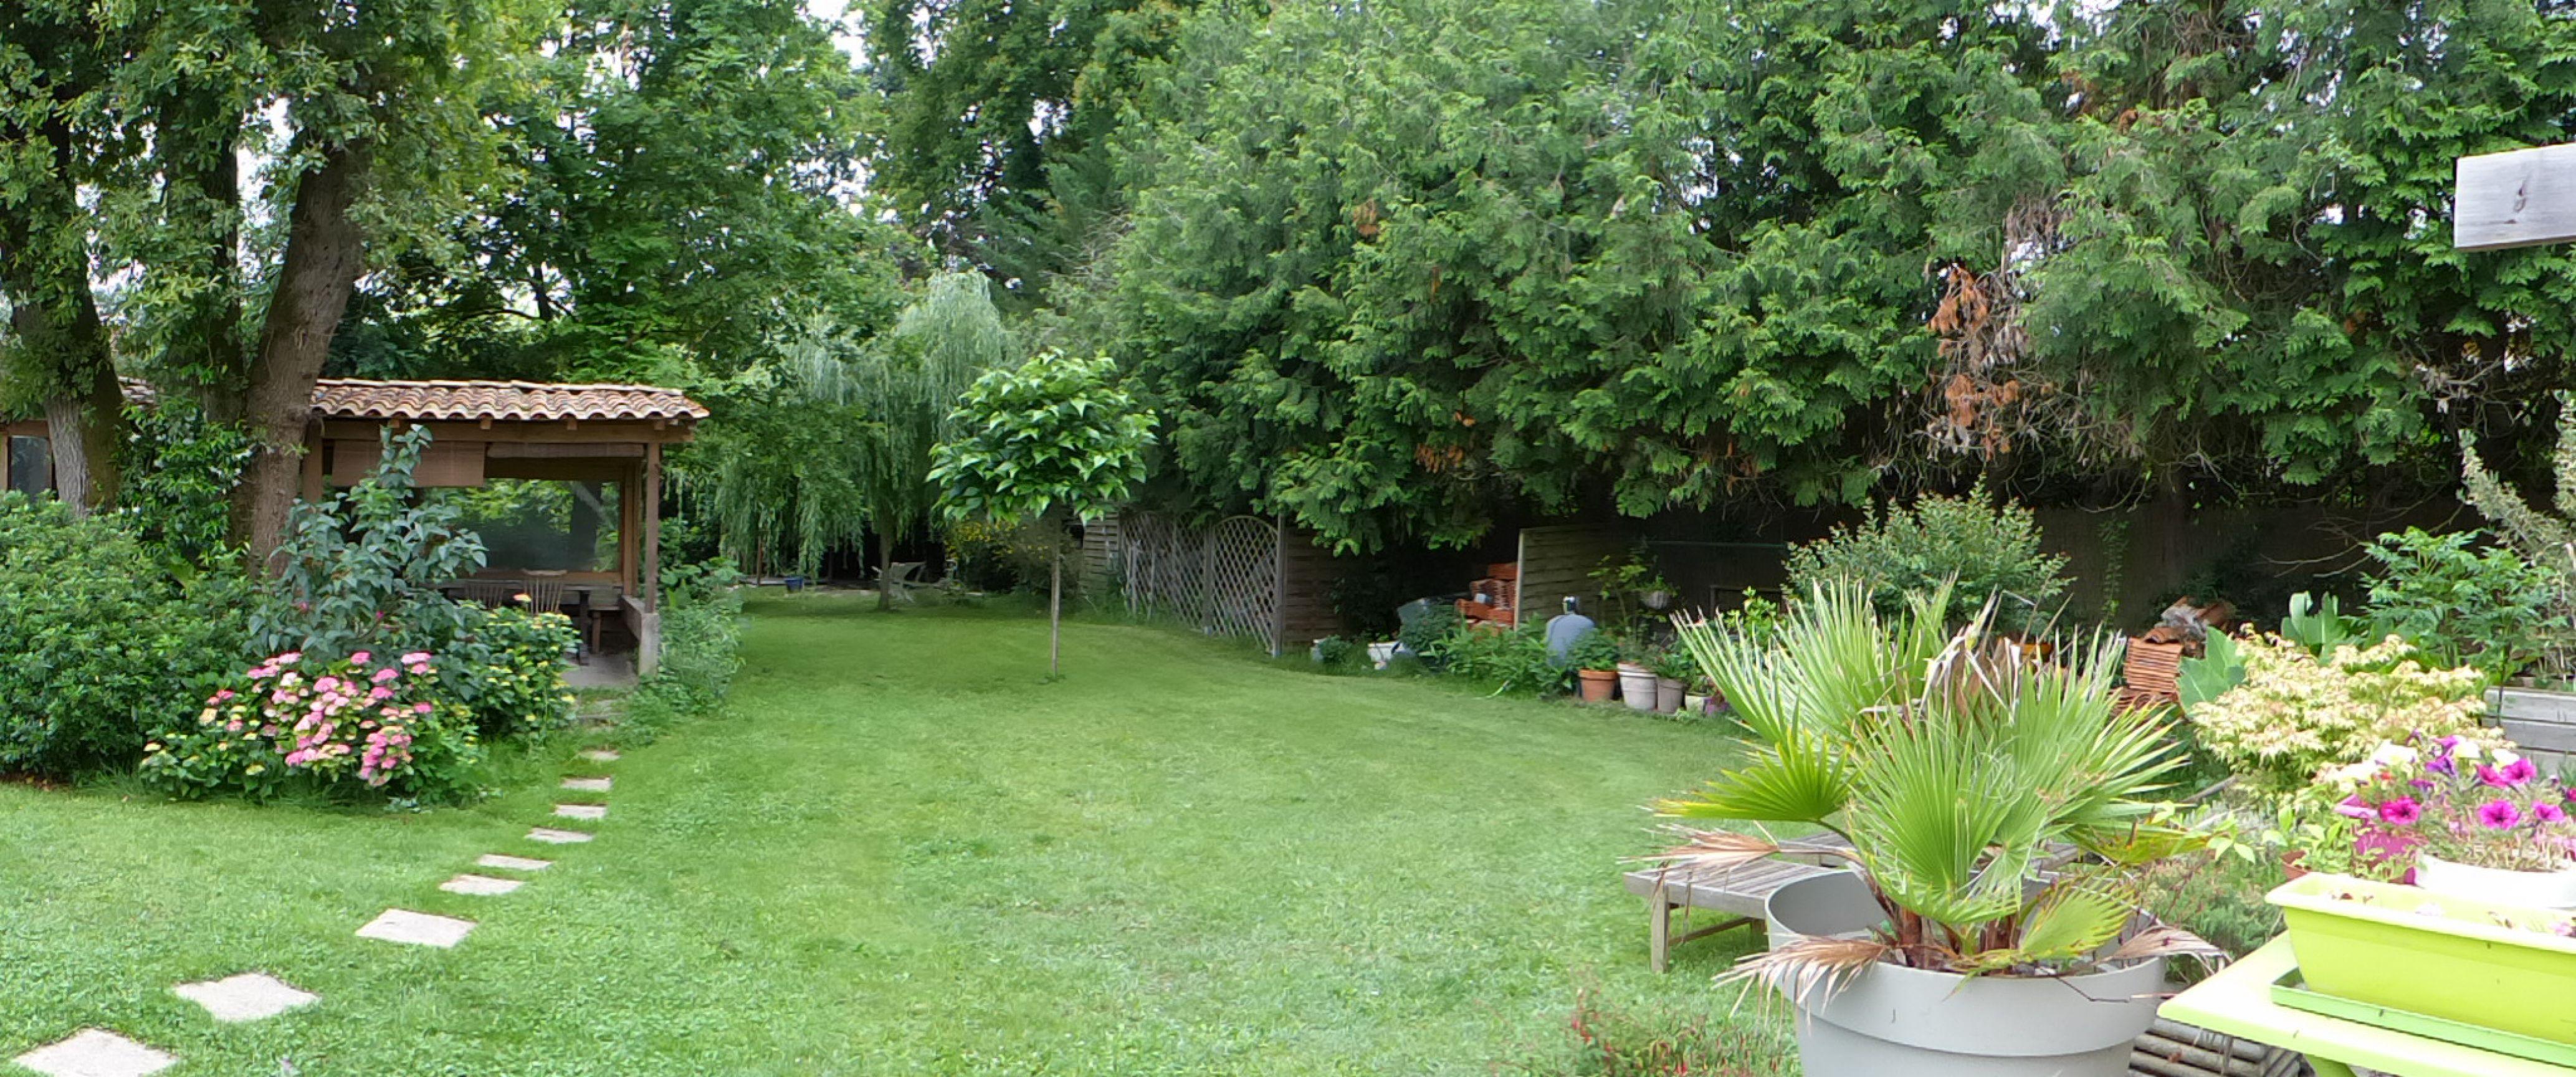 Le jardin principal de la Maison d'hôte Lucilda